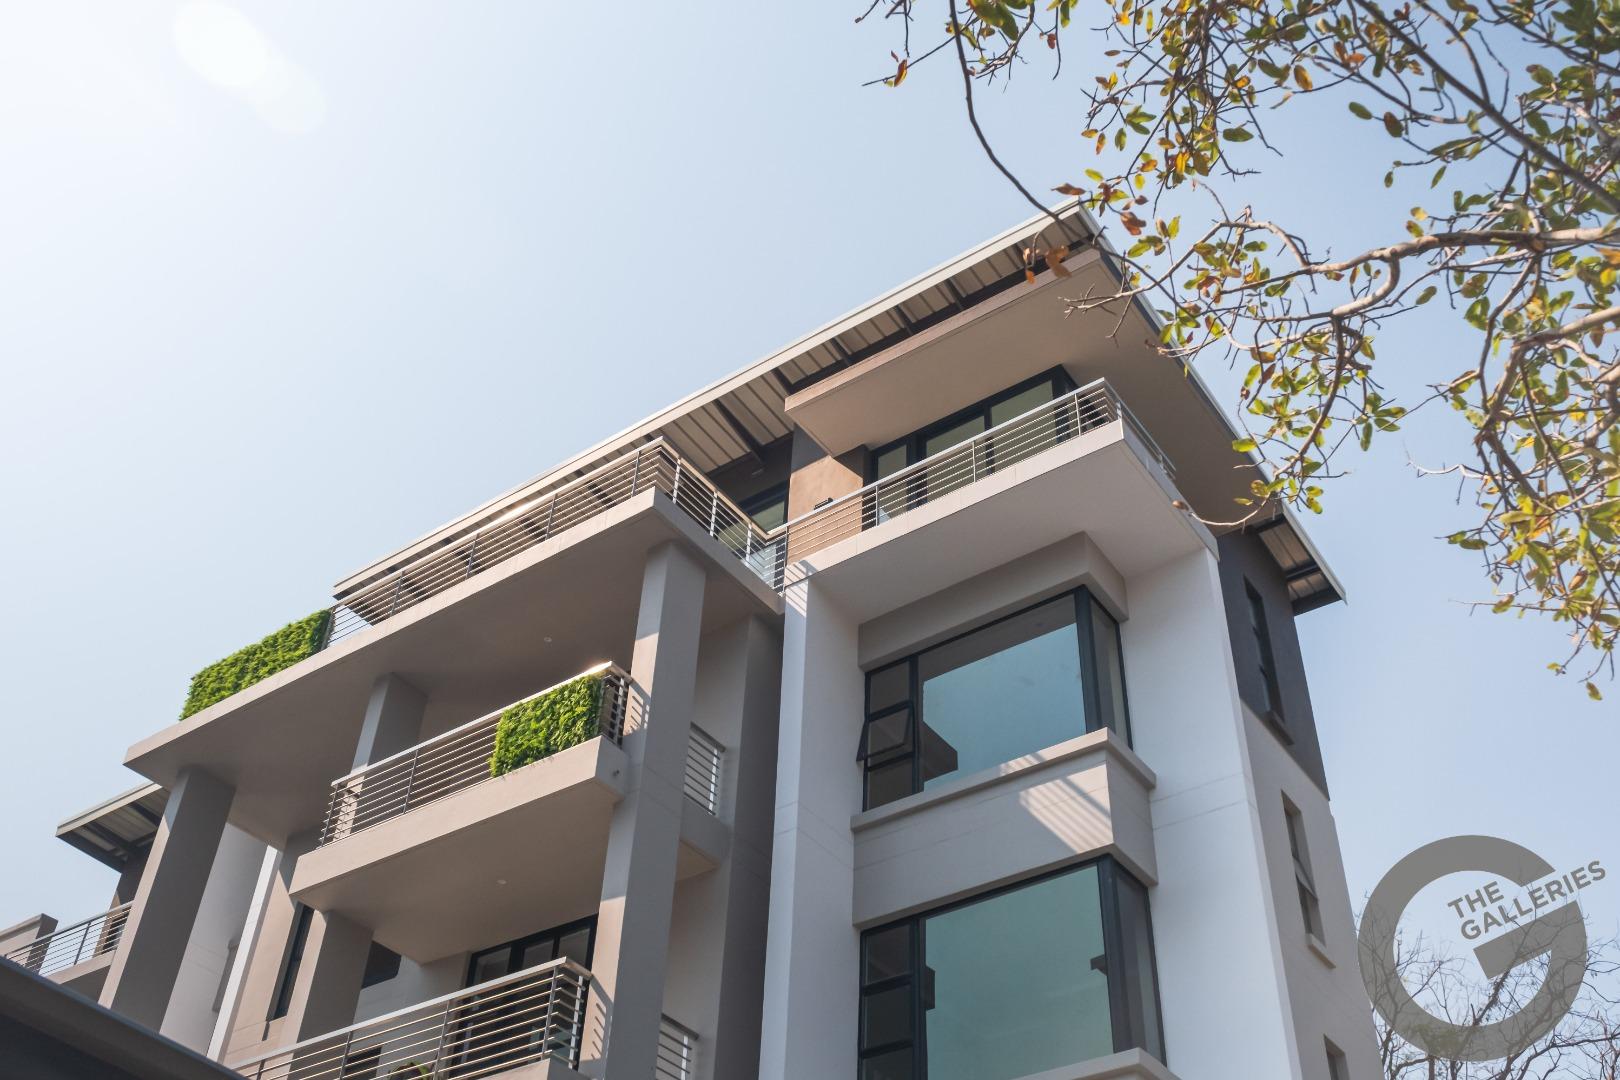 2 Bedroom Apartment / Flat To Rent in Rosebank